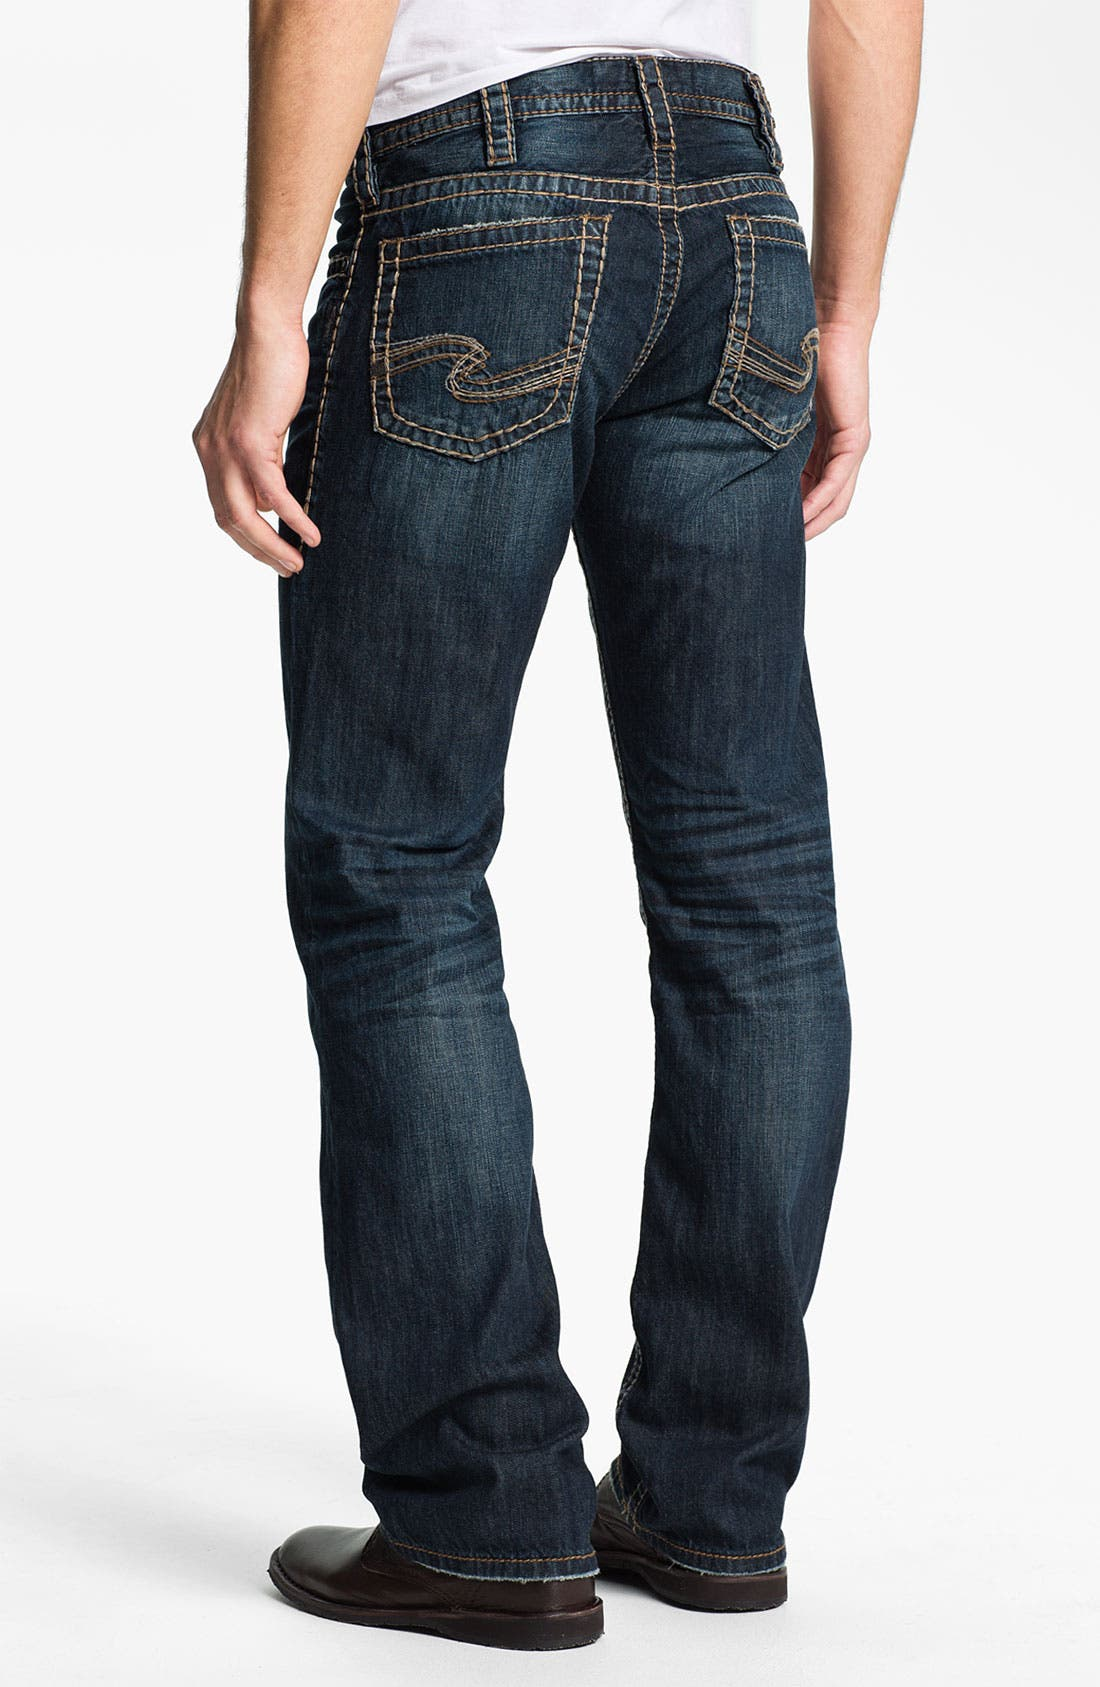 Main Image - Silver Jeans Co. 'Nash Heritage' Straight Leg Jeans (Indigo)